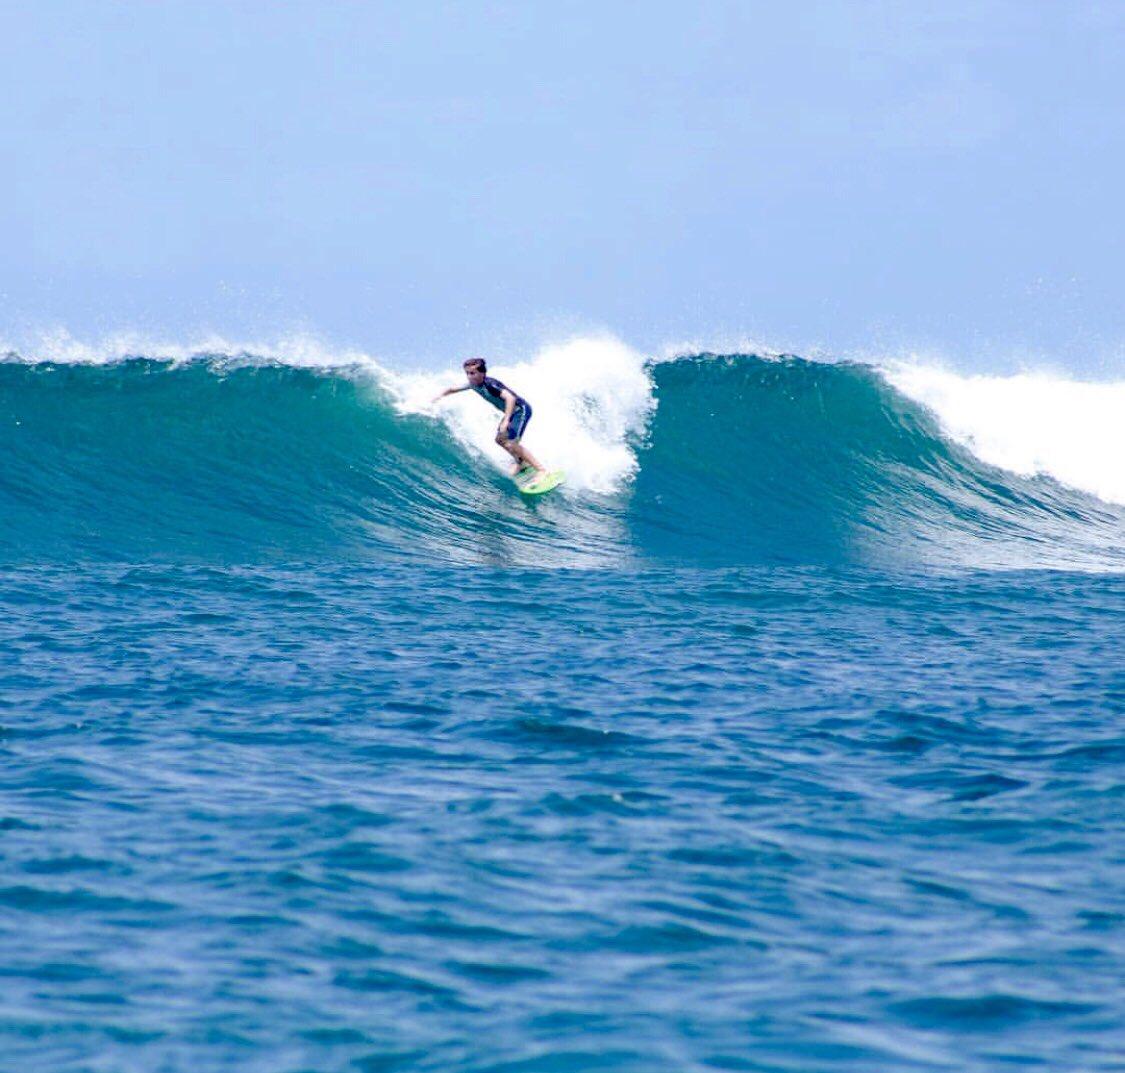 Love seeing the boys back in their happy place #bali #surfasia #surfgroms #schoolholidays #happykids @SimonIslinpic.twitter.com/zLb0N3kvIx